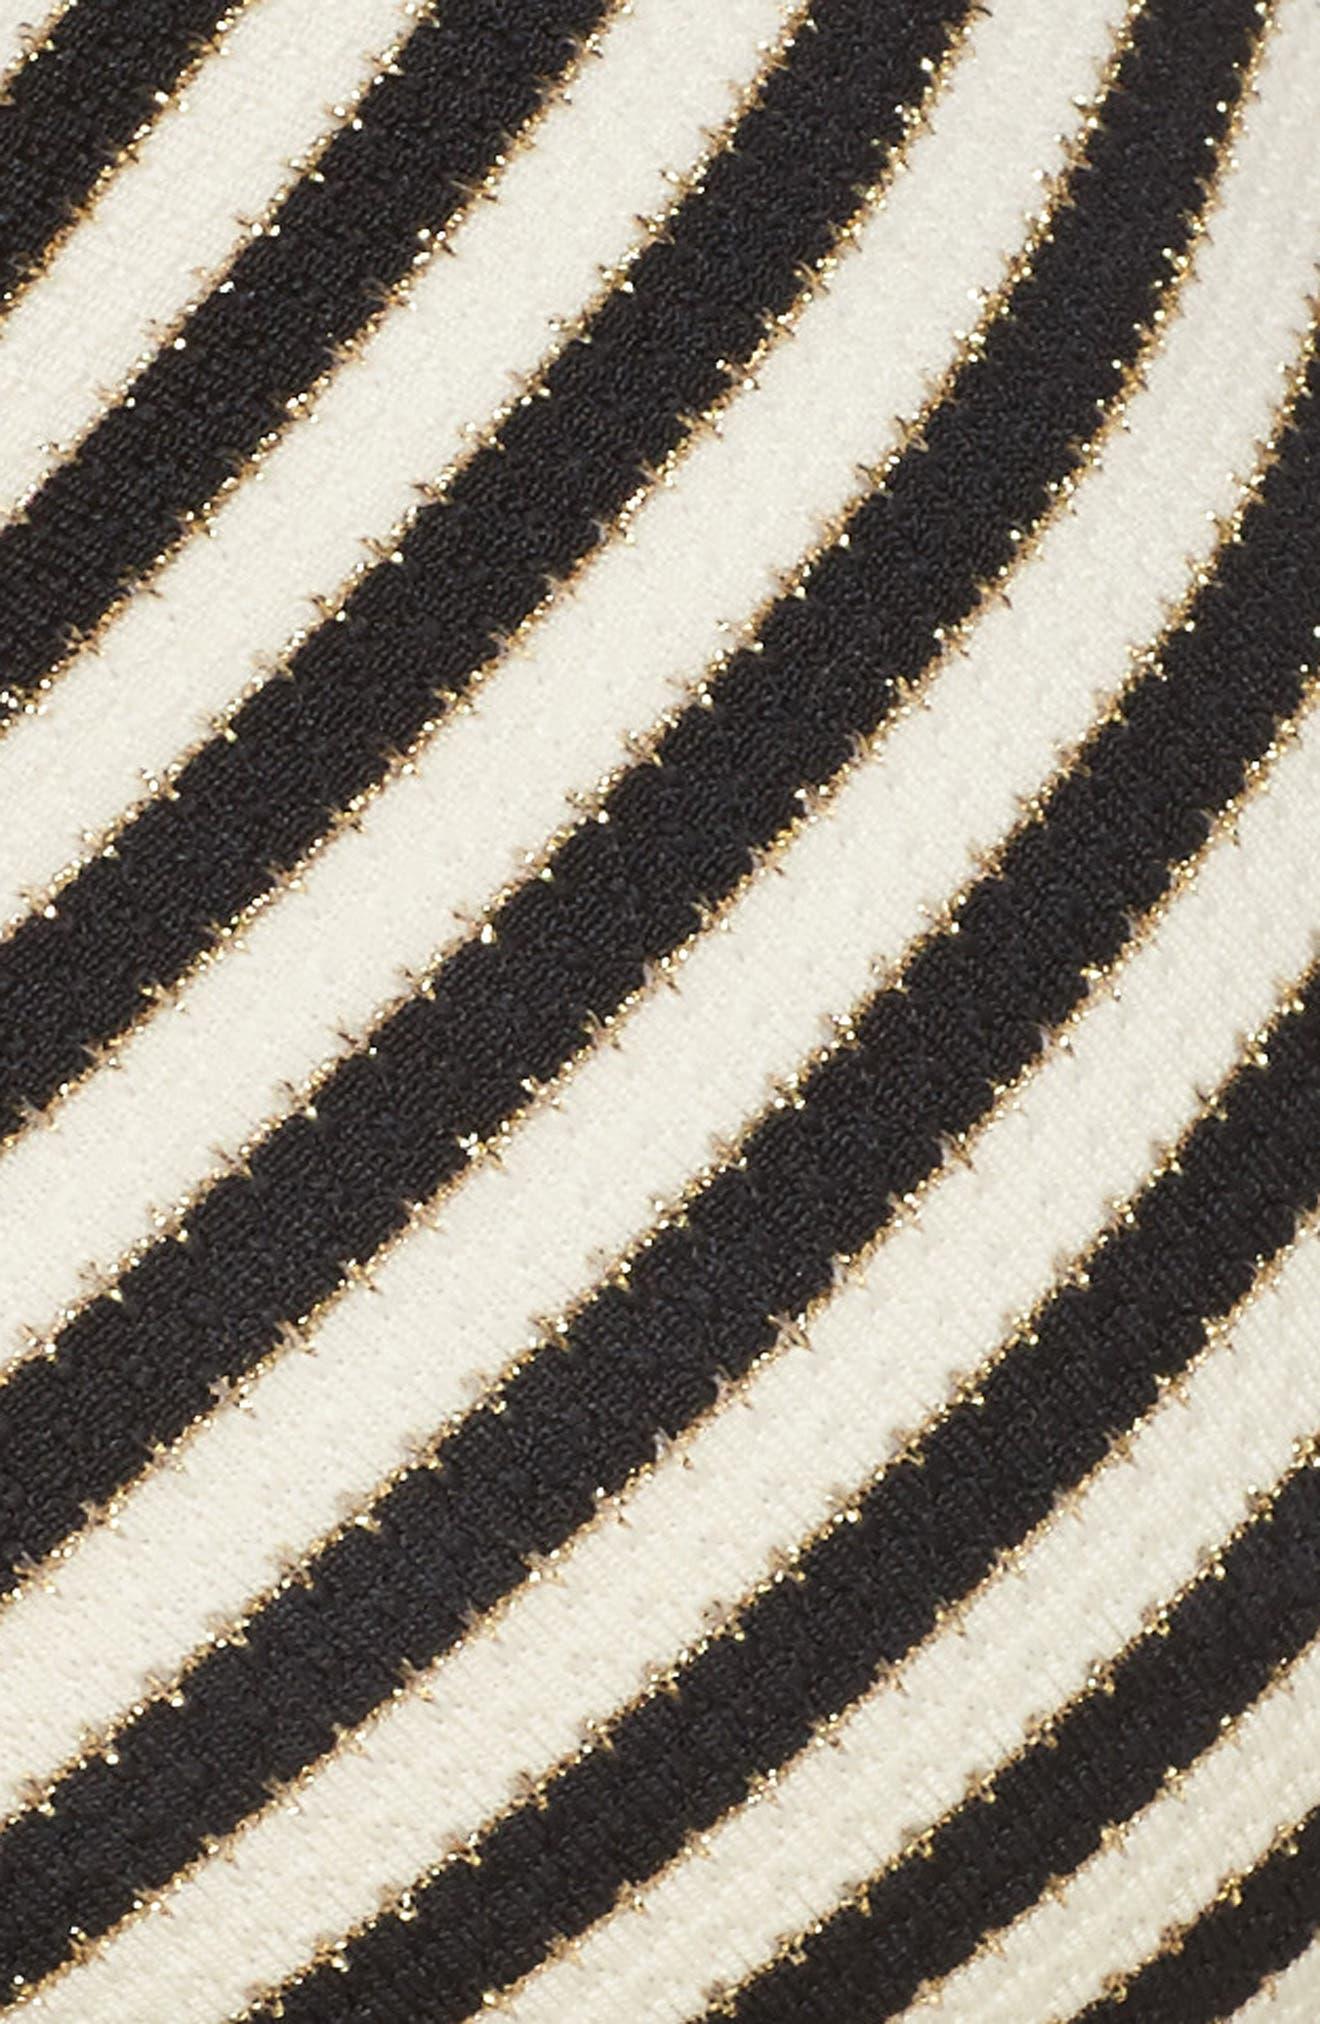 Carmen Stripe Halter Bikini Top,                             Alternate thumbnail 8, color,                             Black Ivory